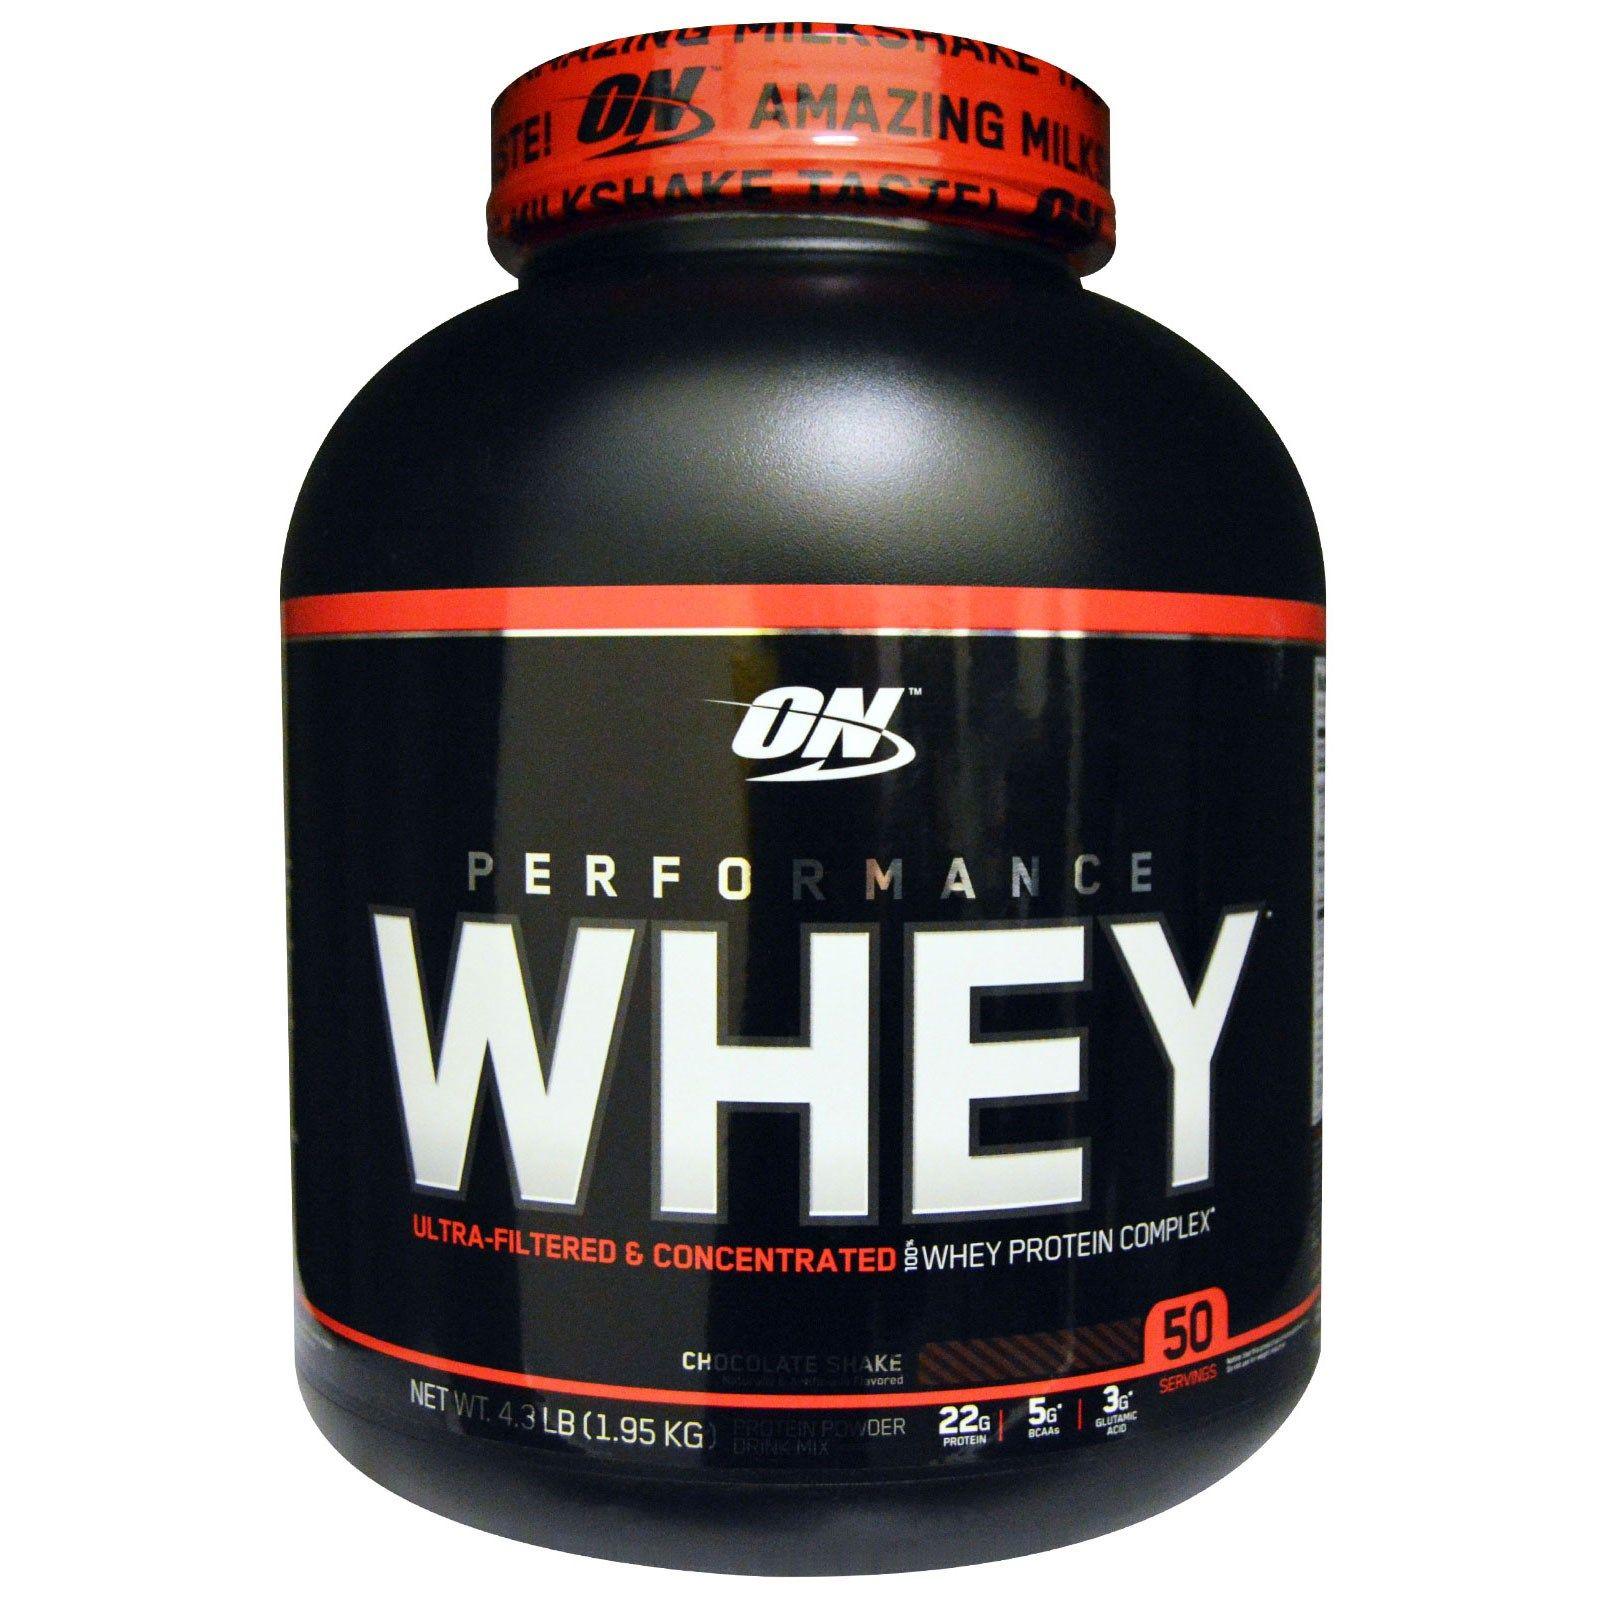 Optimum Nutrition, Performance Whey, Chocolate Shake, 4.3